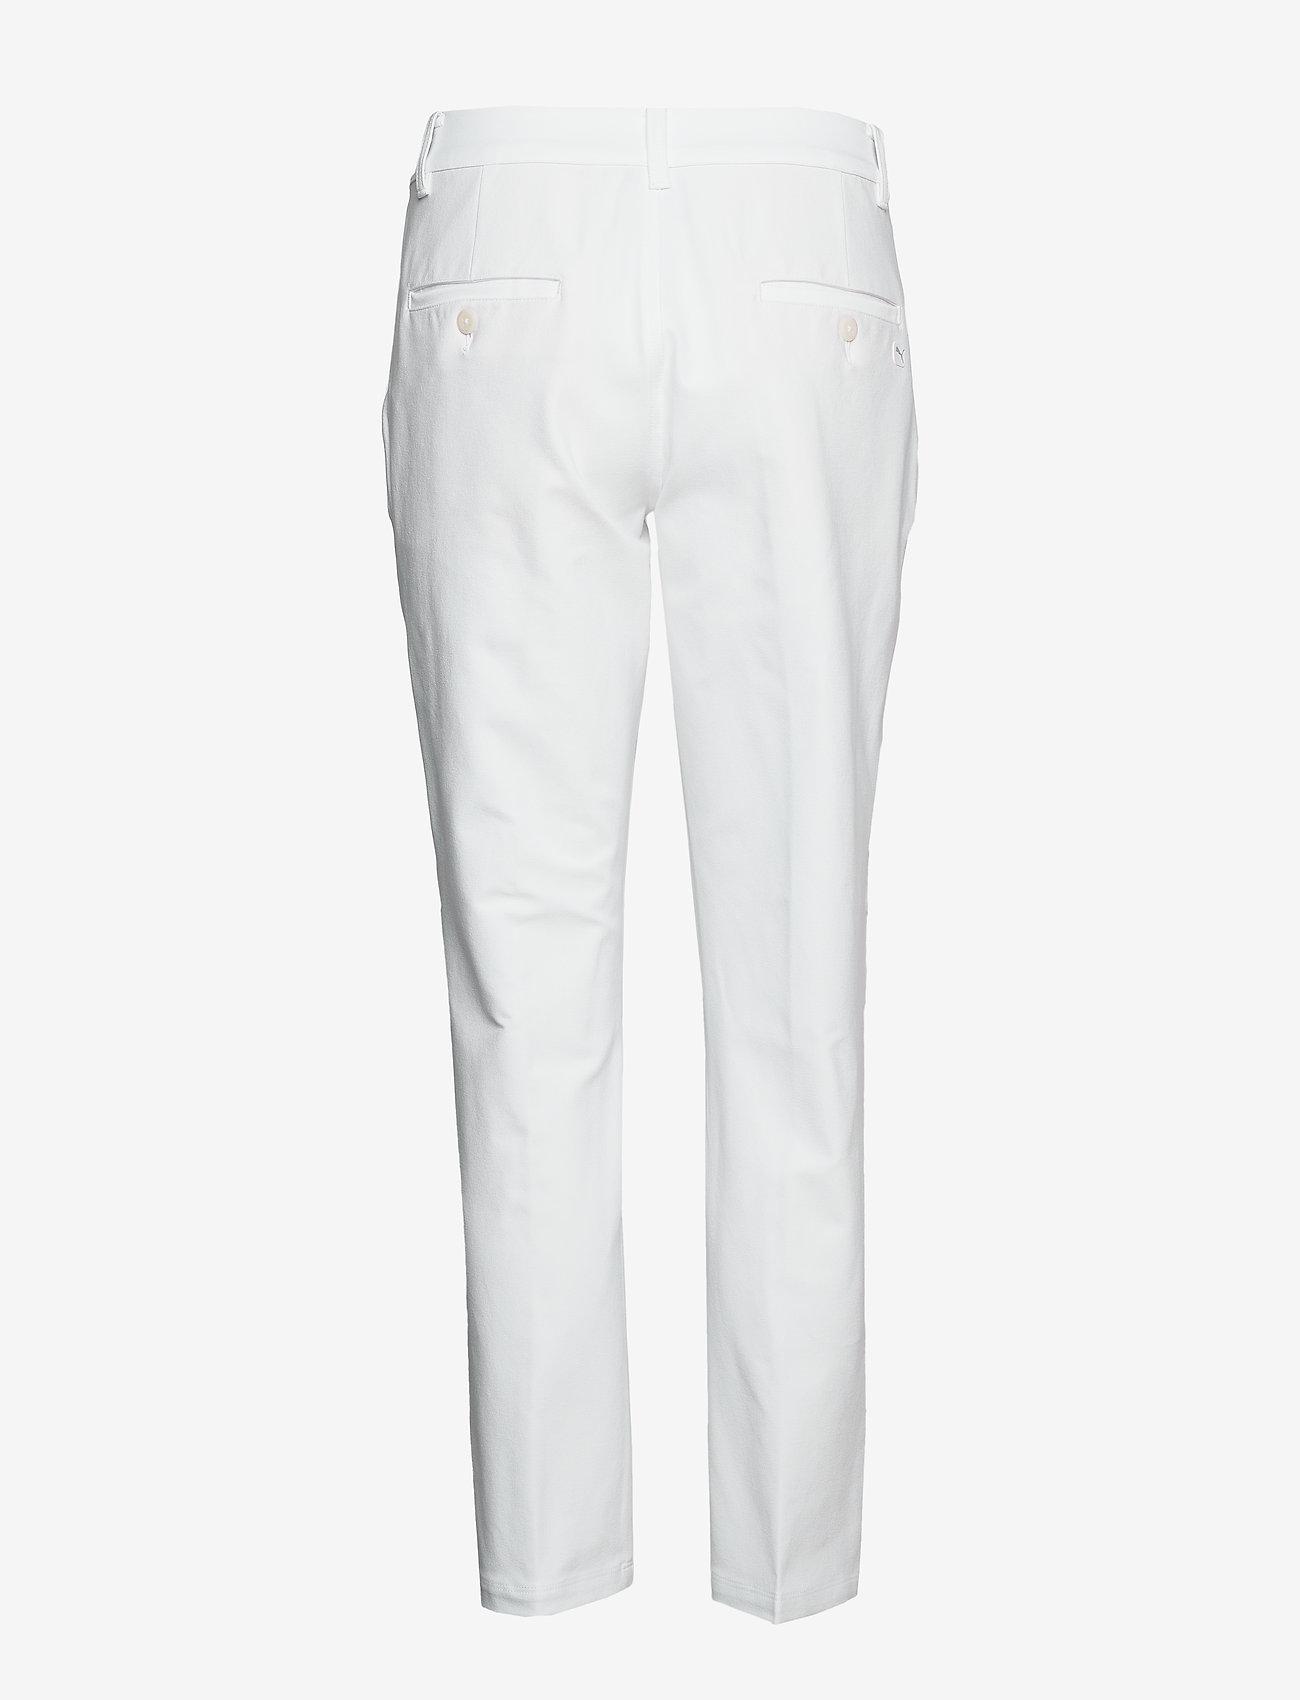 PUMA Golf - W Golf Pant - golfbroeken - bright white - 1